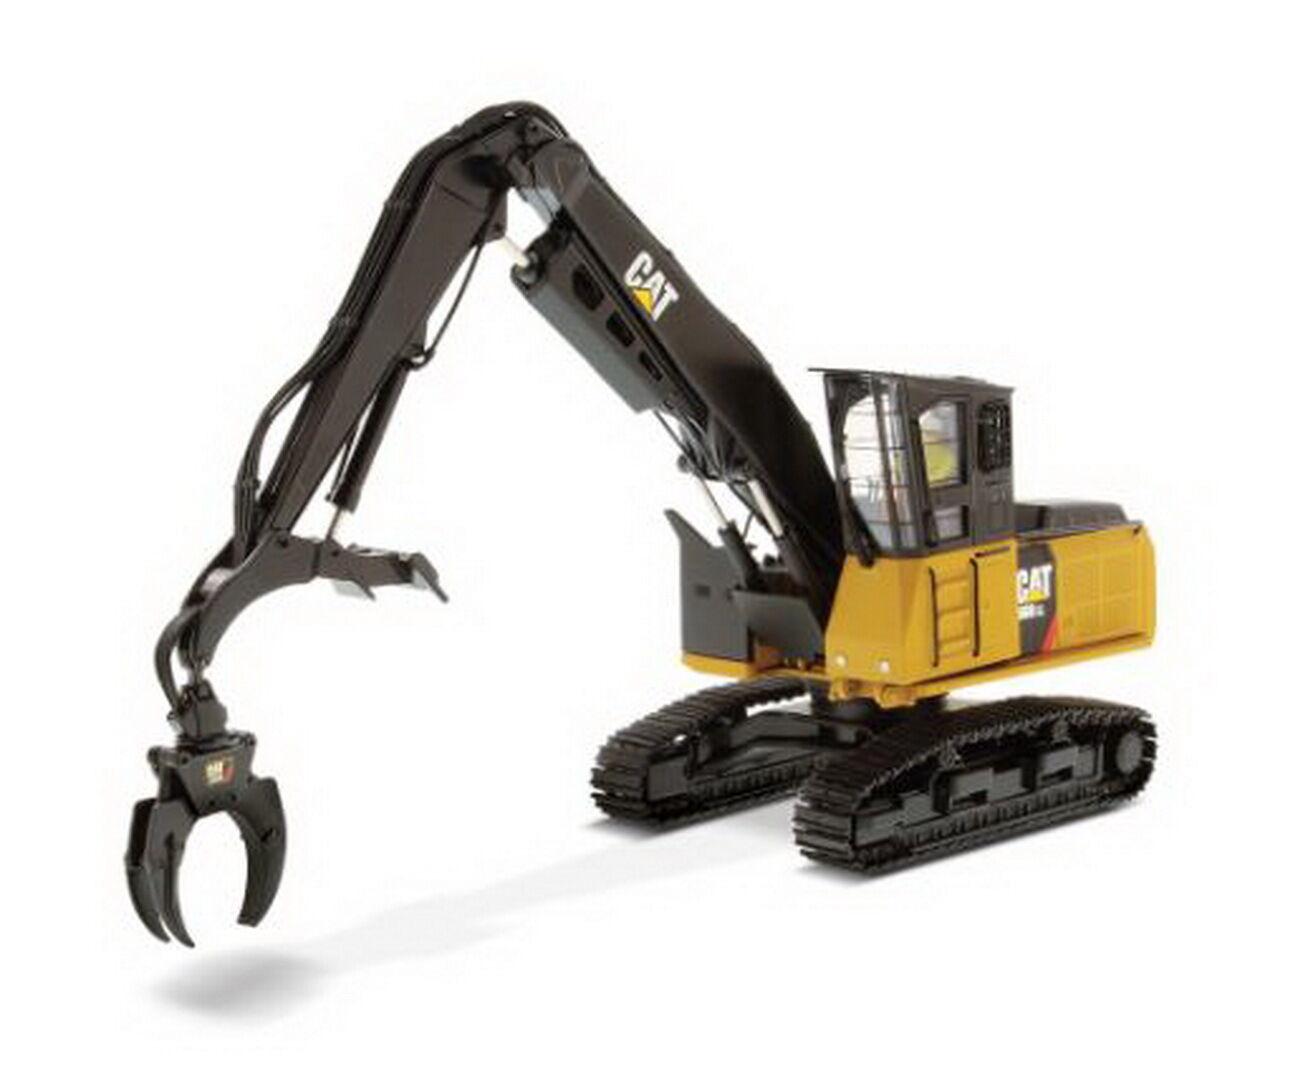 1/50 dm Caterpillar Cat 568 Modelo Diecast configuración Cargador de registro ll 85922